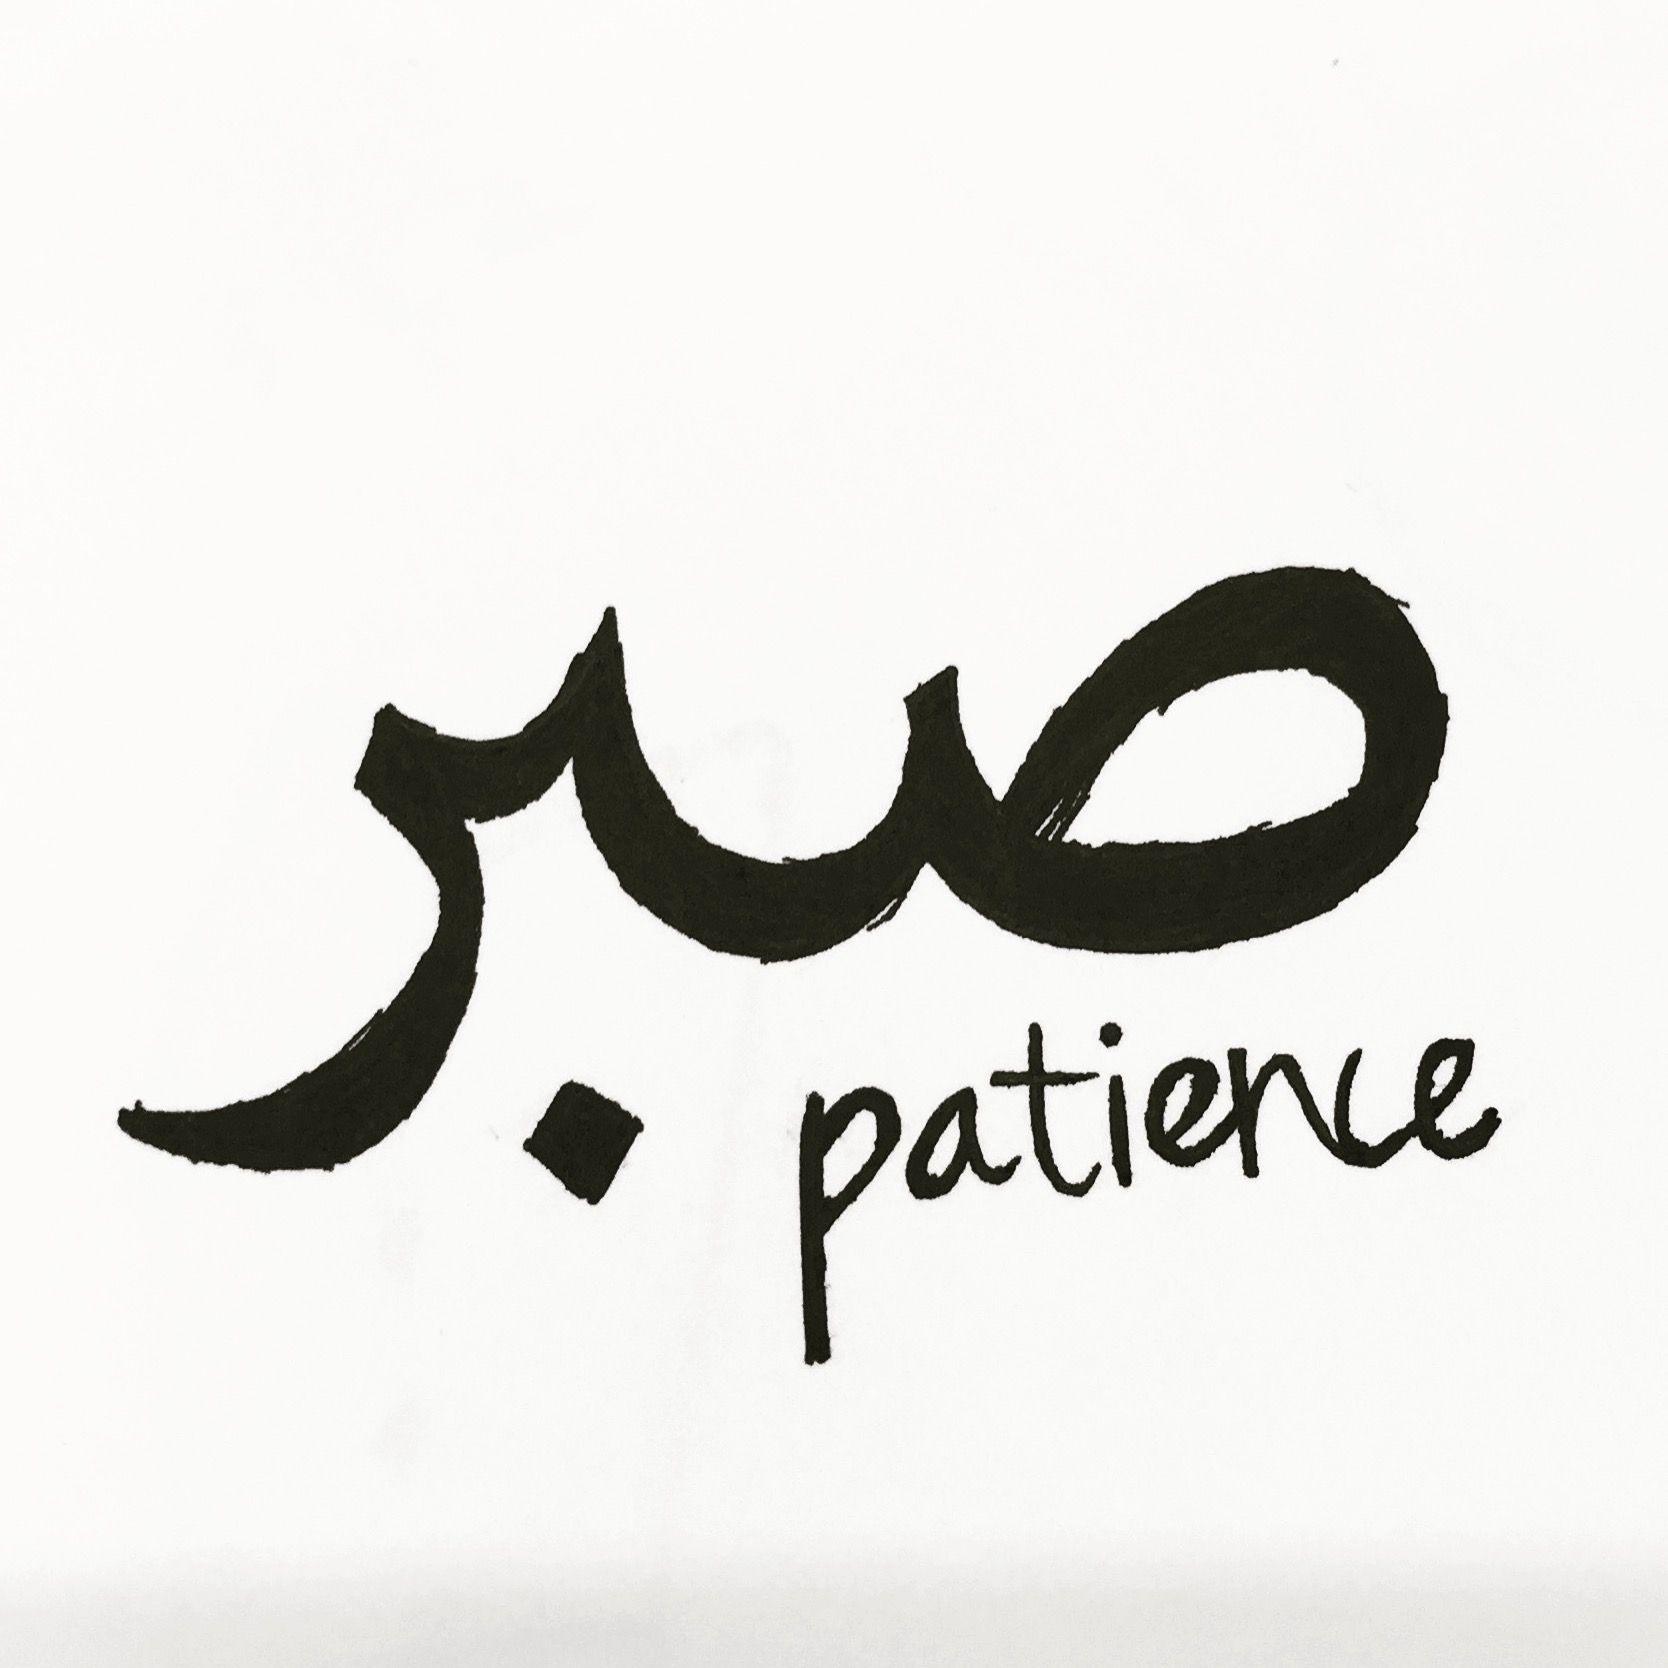 Tattoo Fuß Frau Arabische: Patience In Arabic. Sabr. #arabic #calligraphy